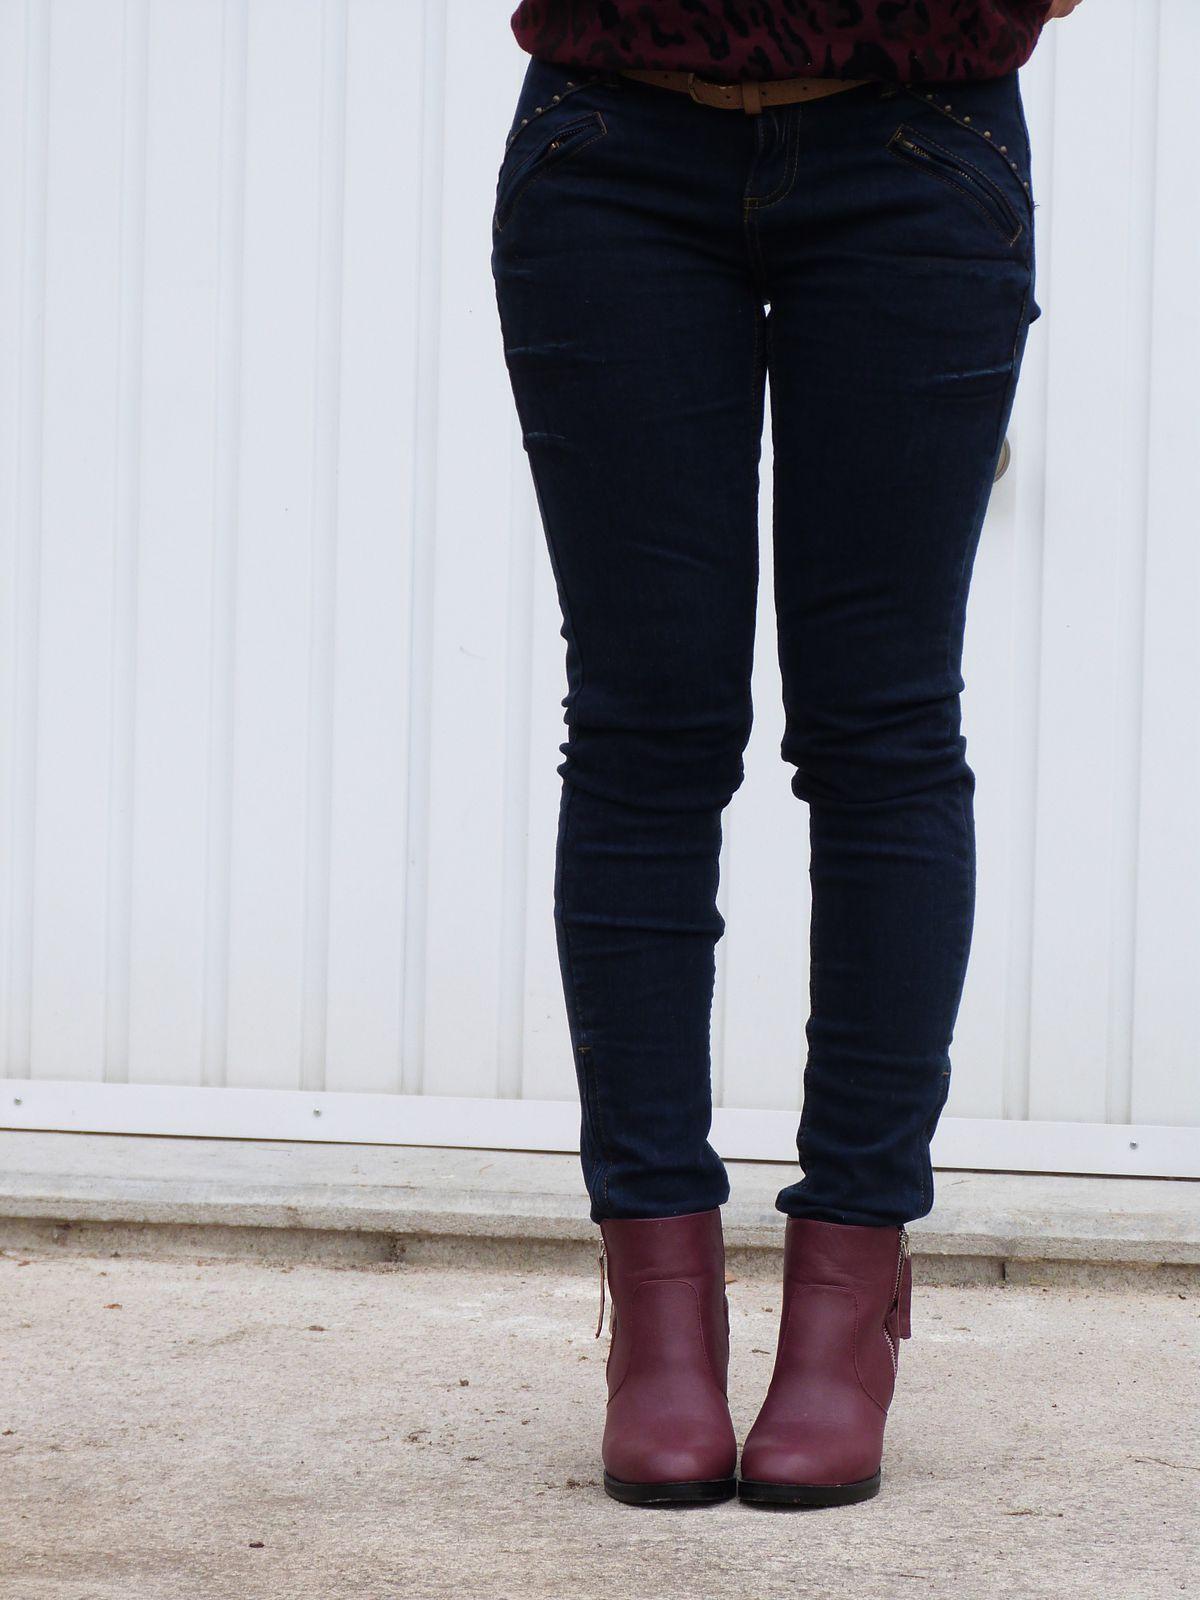 blouson : PIMKIE   sweat : PROMOD   jeans : PROMOD   bottines : ASOS .